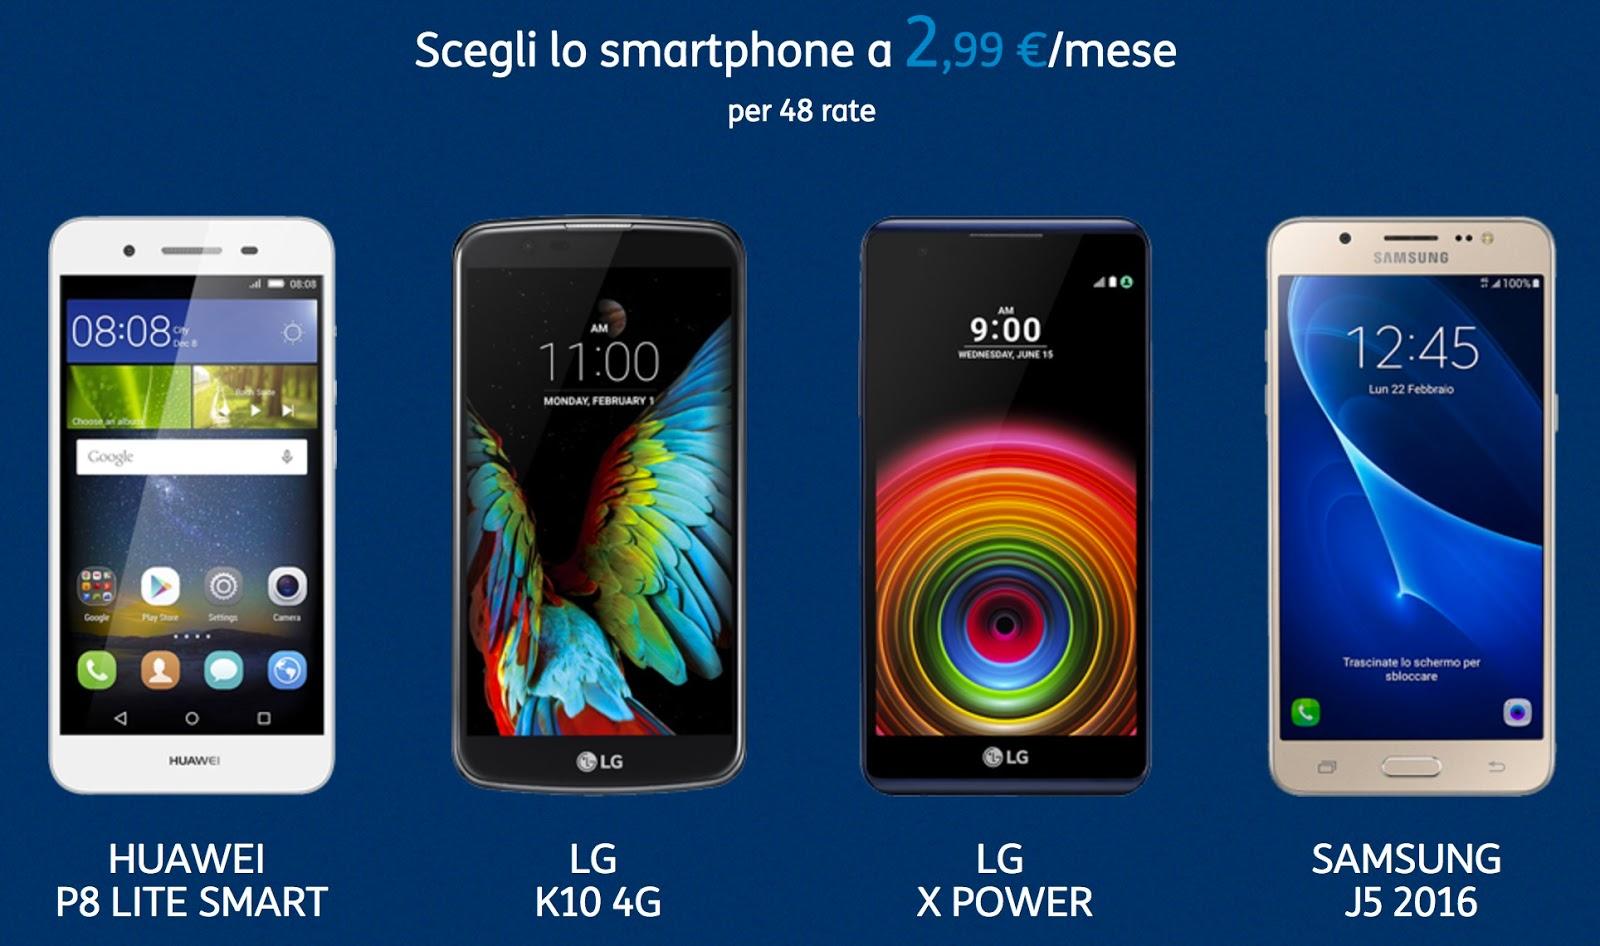 Smartphone con TIM a 2,99 €/mese per 48 rate